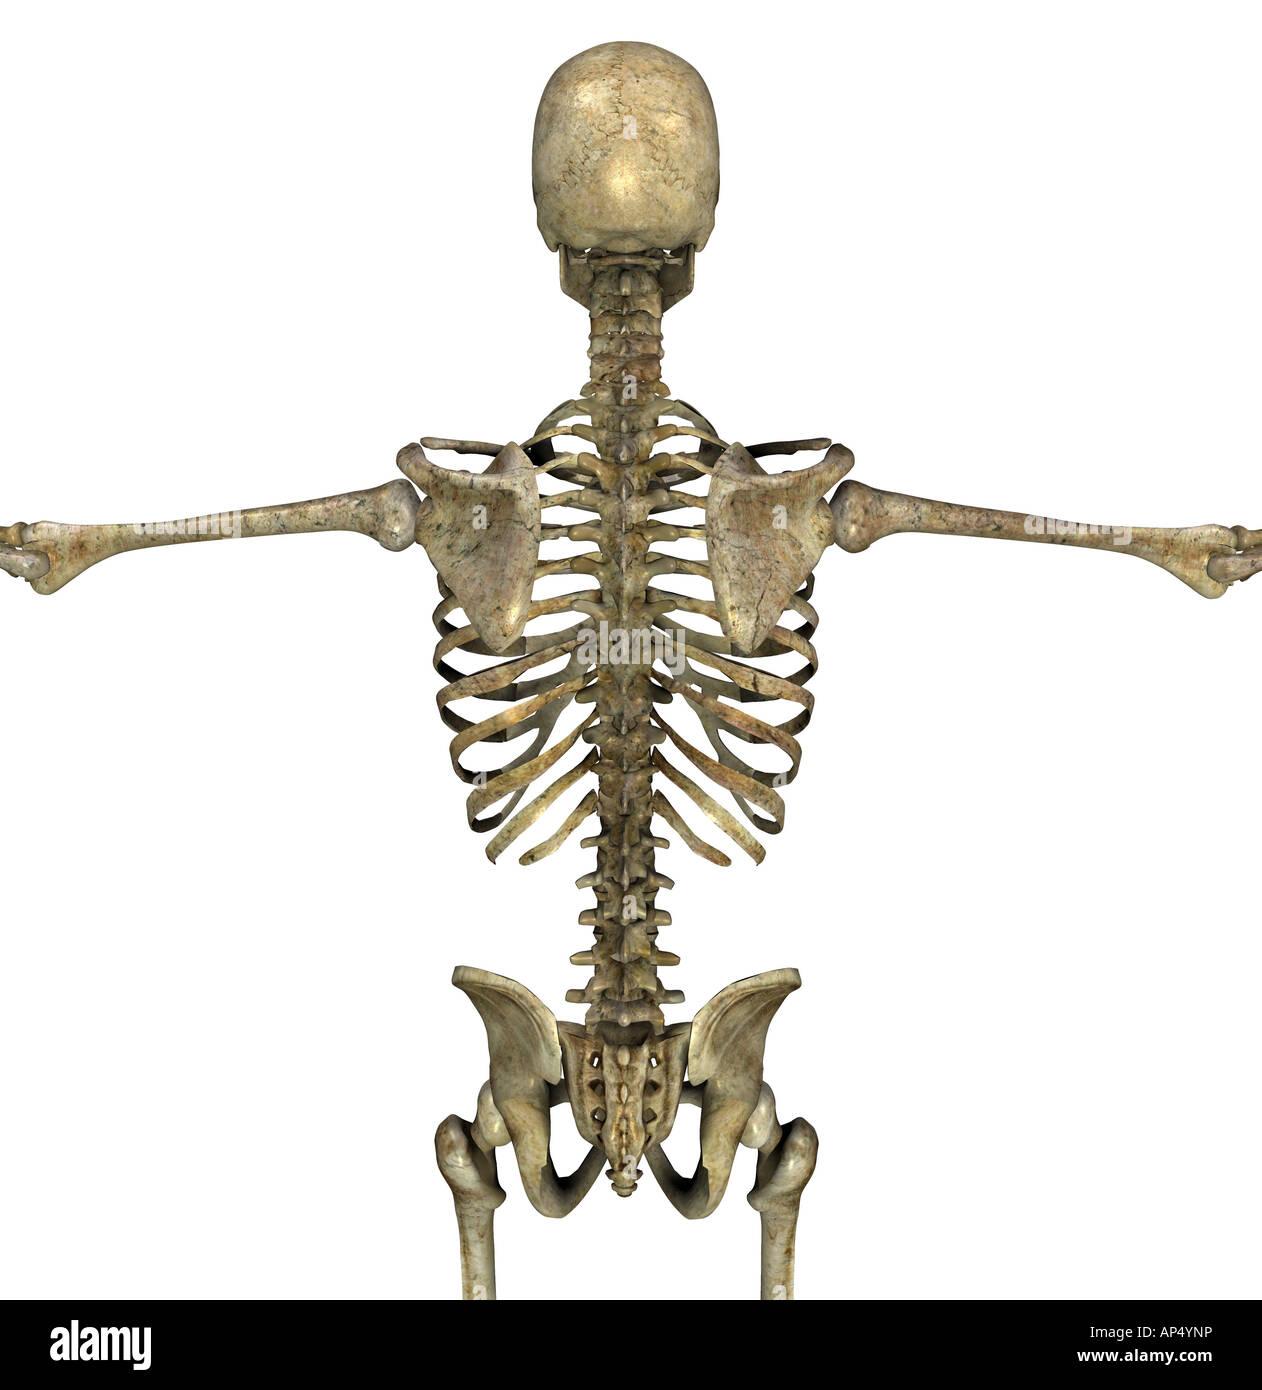 Wirbelknochen Stock Photos & Wirbelknochen Stock Images - Alamy